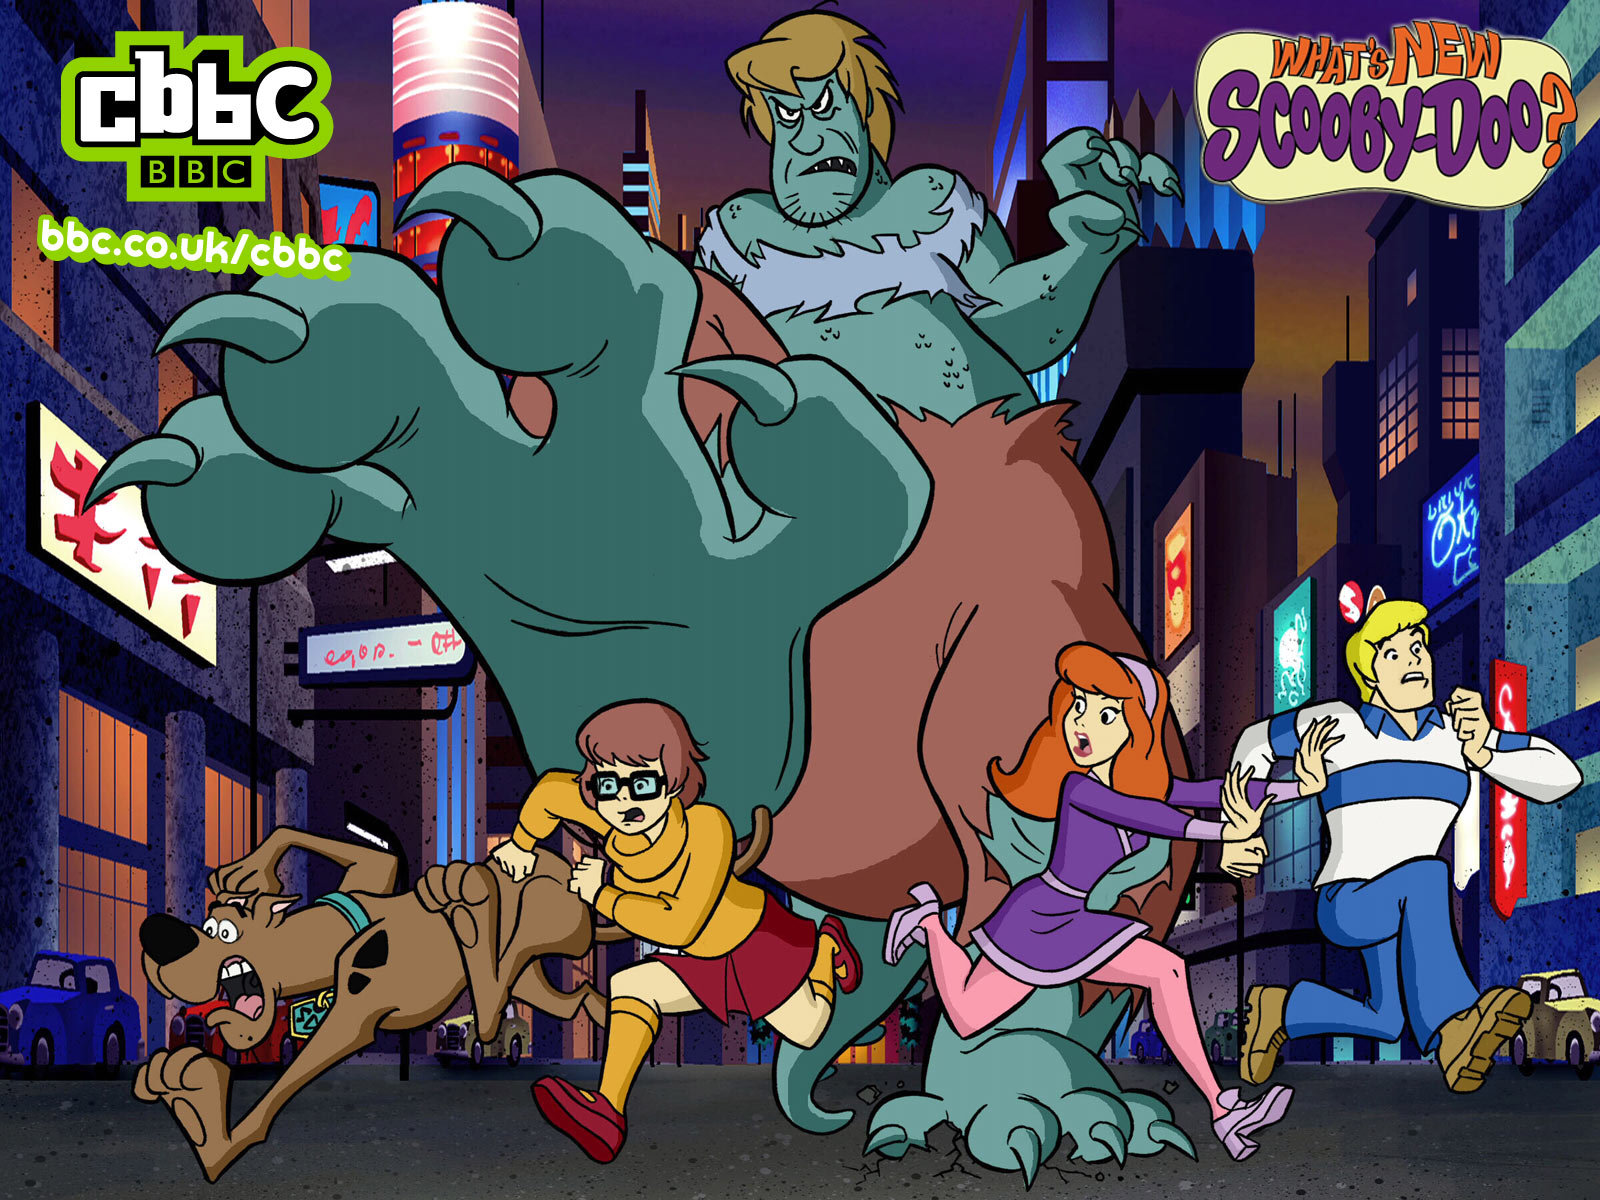 Scooby Doo Christmas Wallpaper - WallpaperSafari